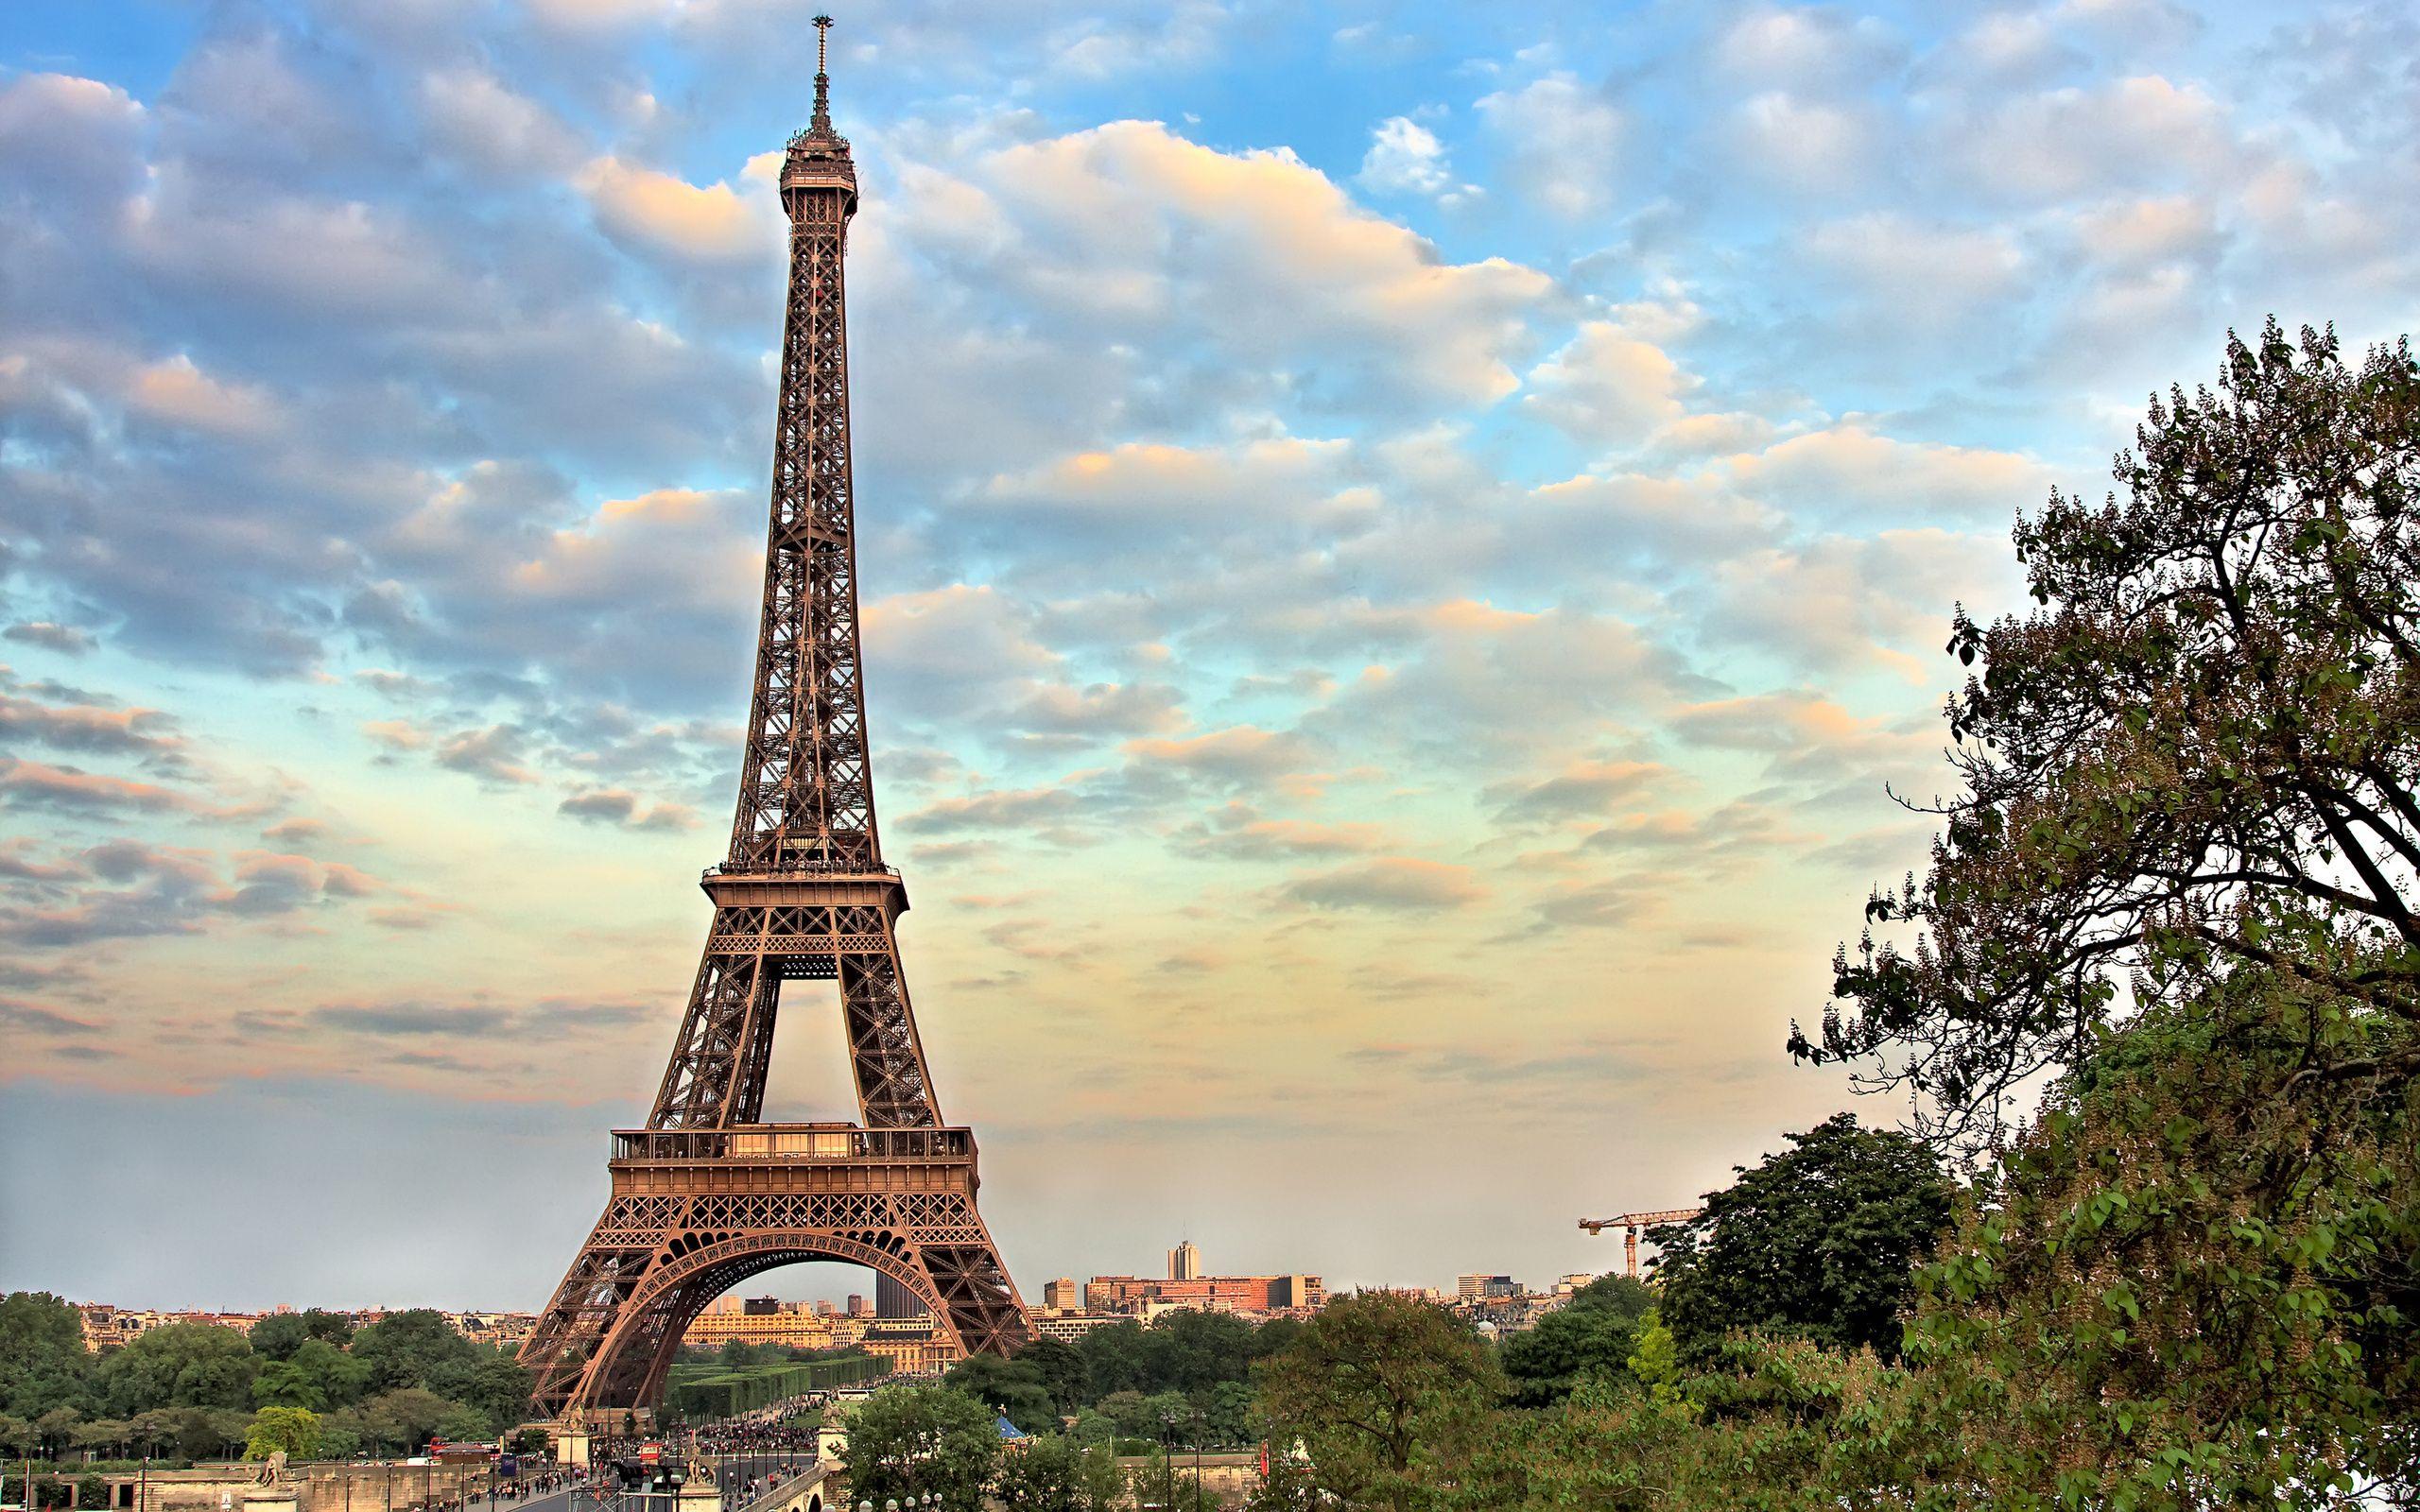 Обои Эйфелева башня, рисунок. Города foto 6